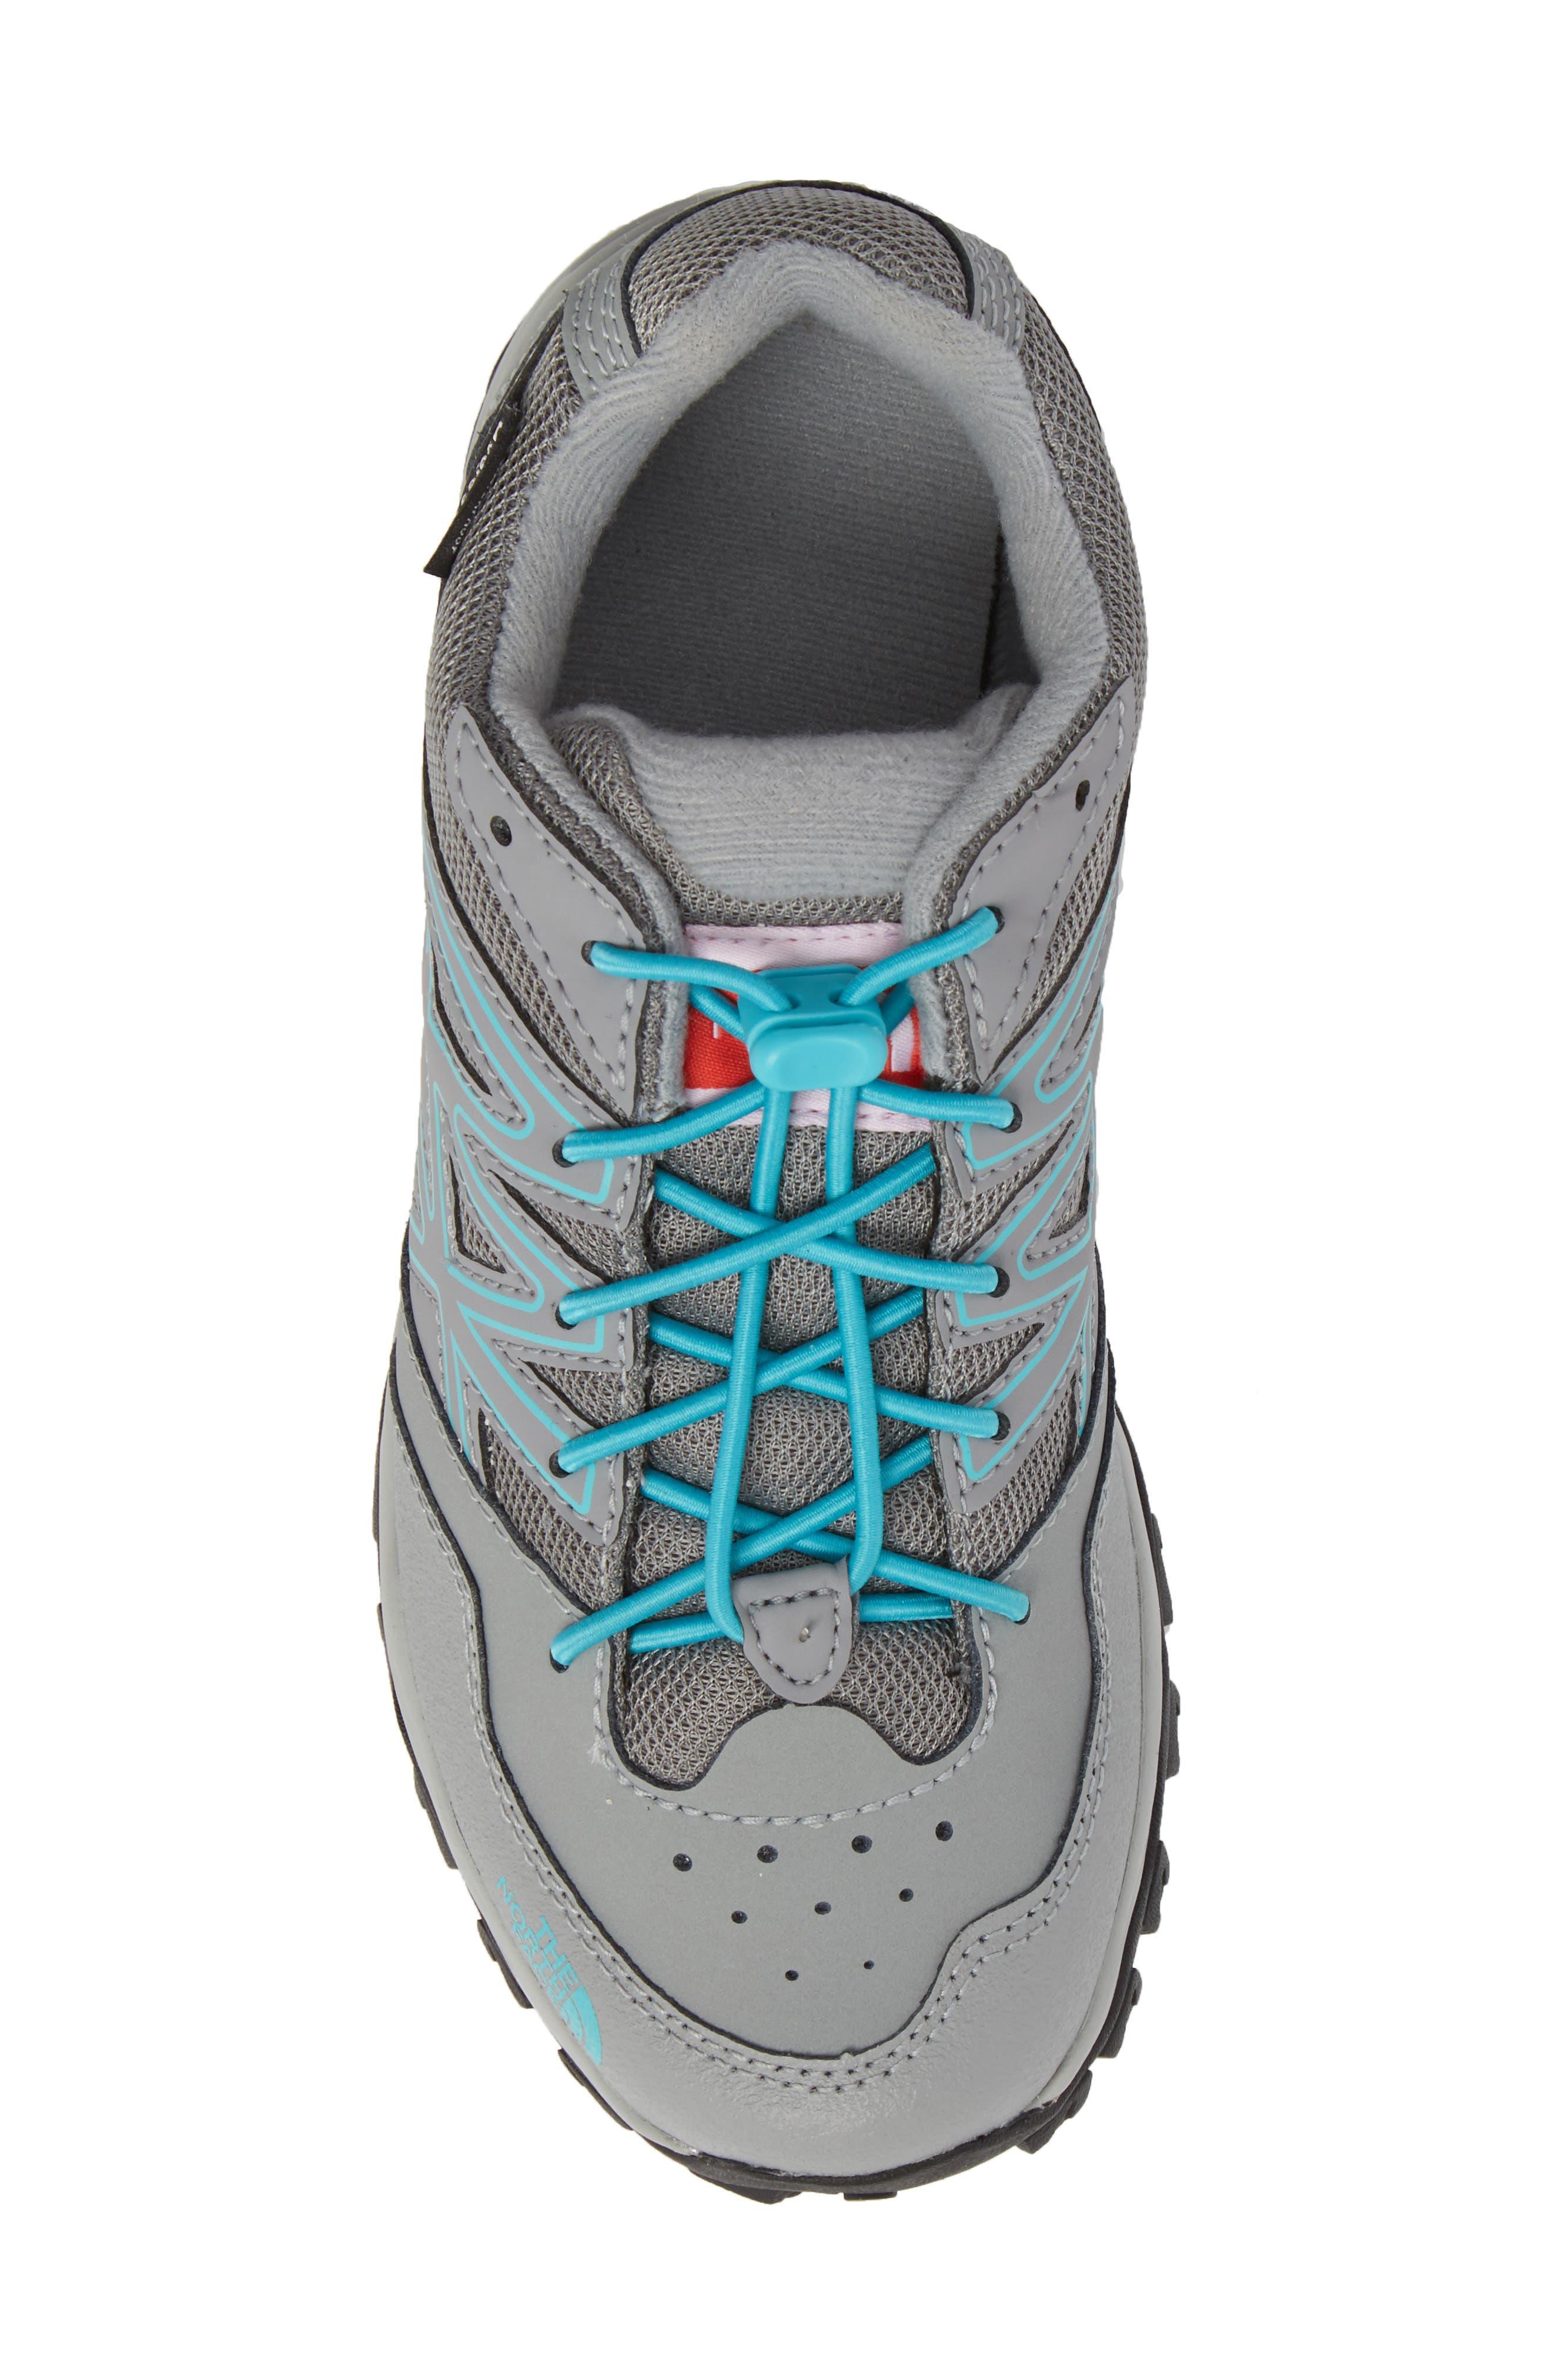 Hedgehog Hiker Boot,                             Alternate thumbnail 5, color,                             022